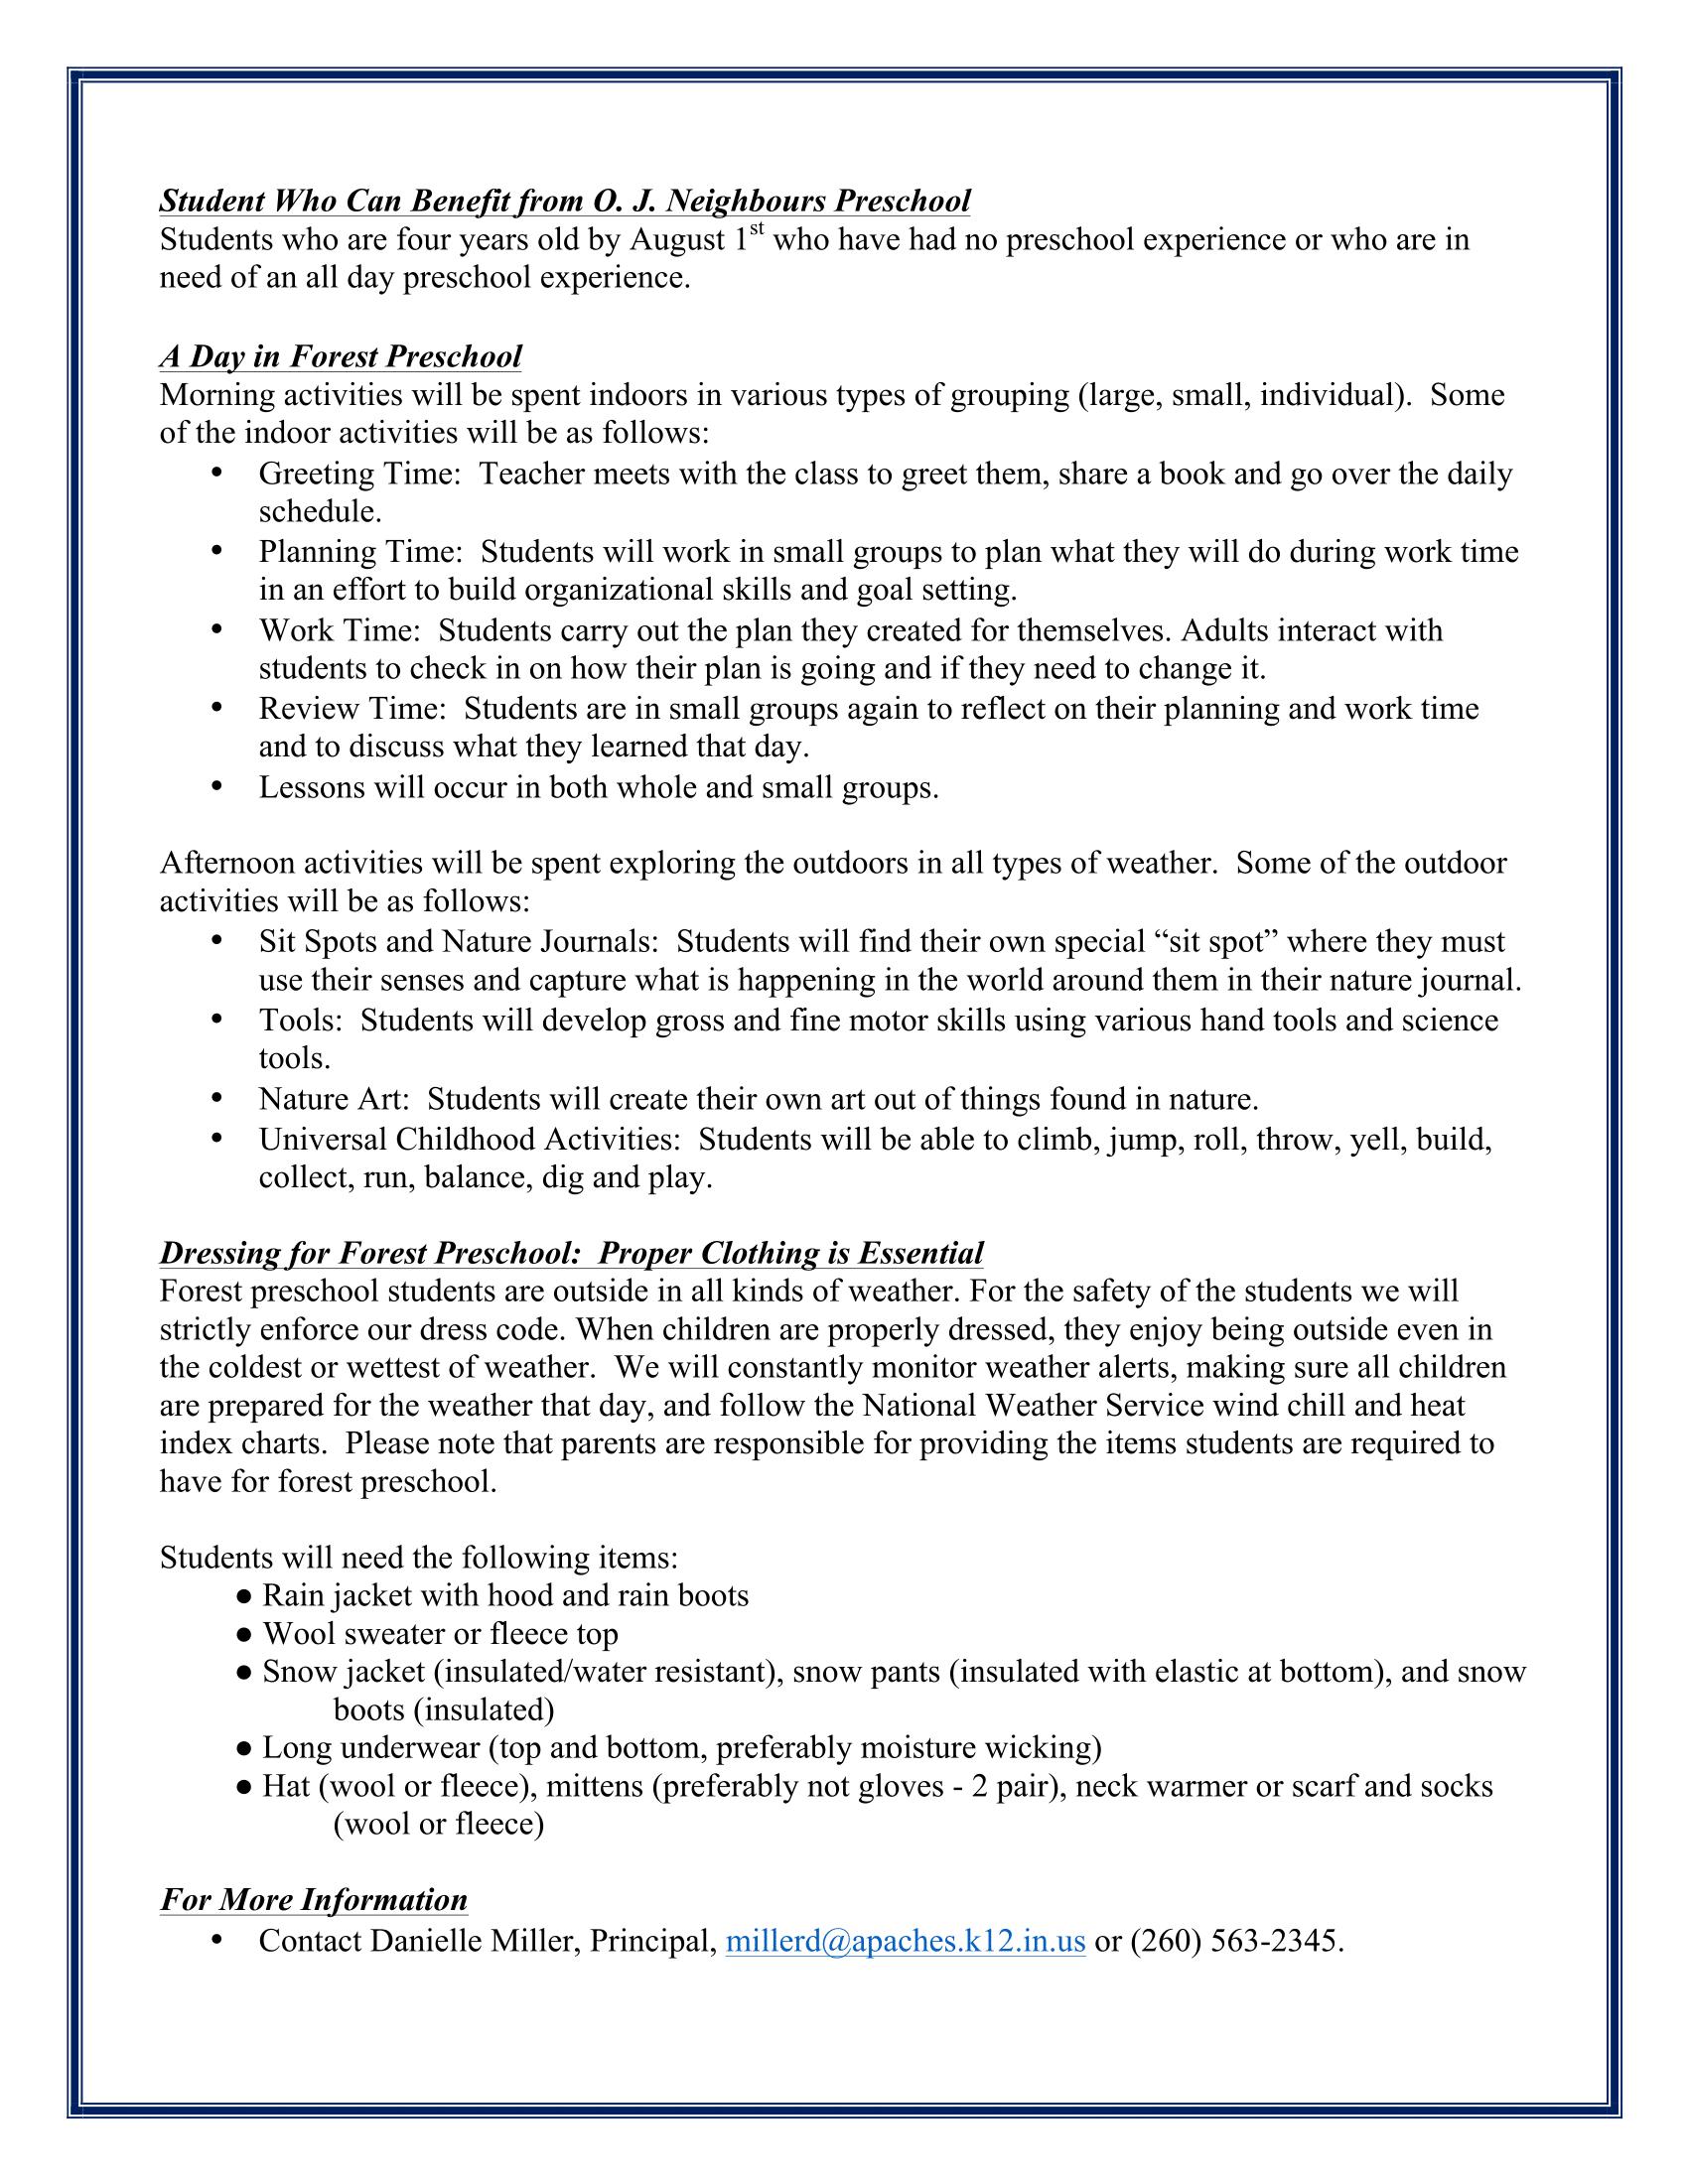 Forest Preschool Information Page 2